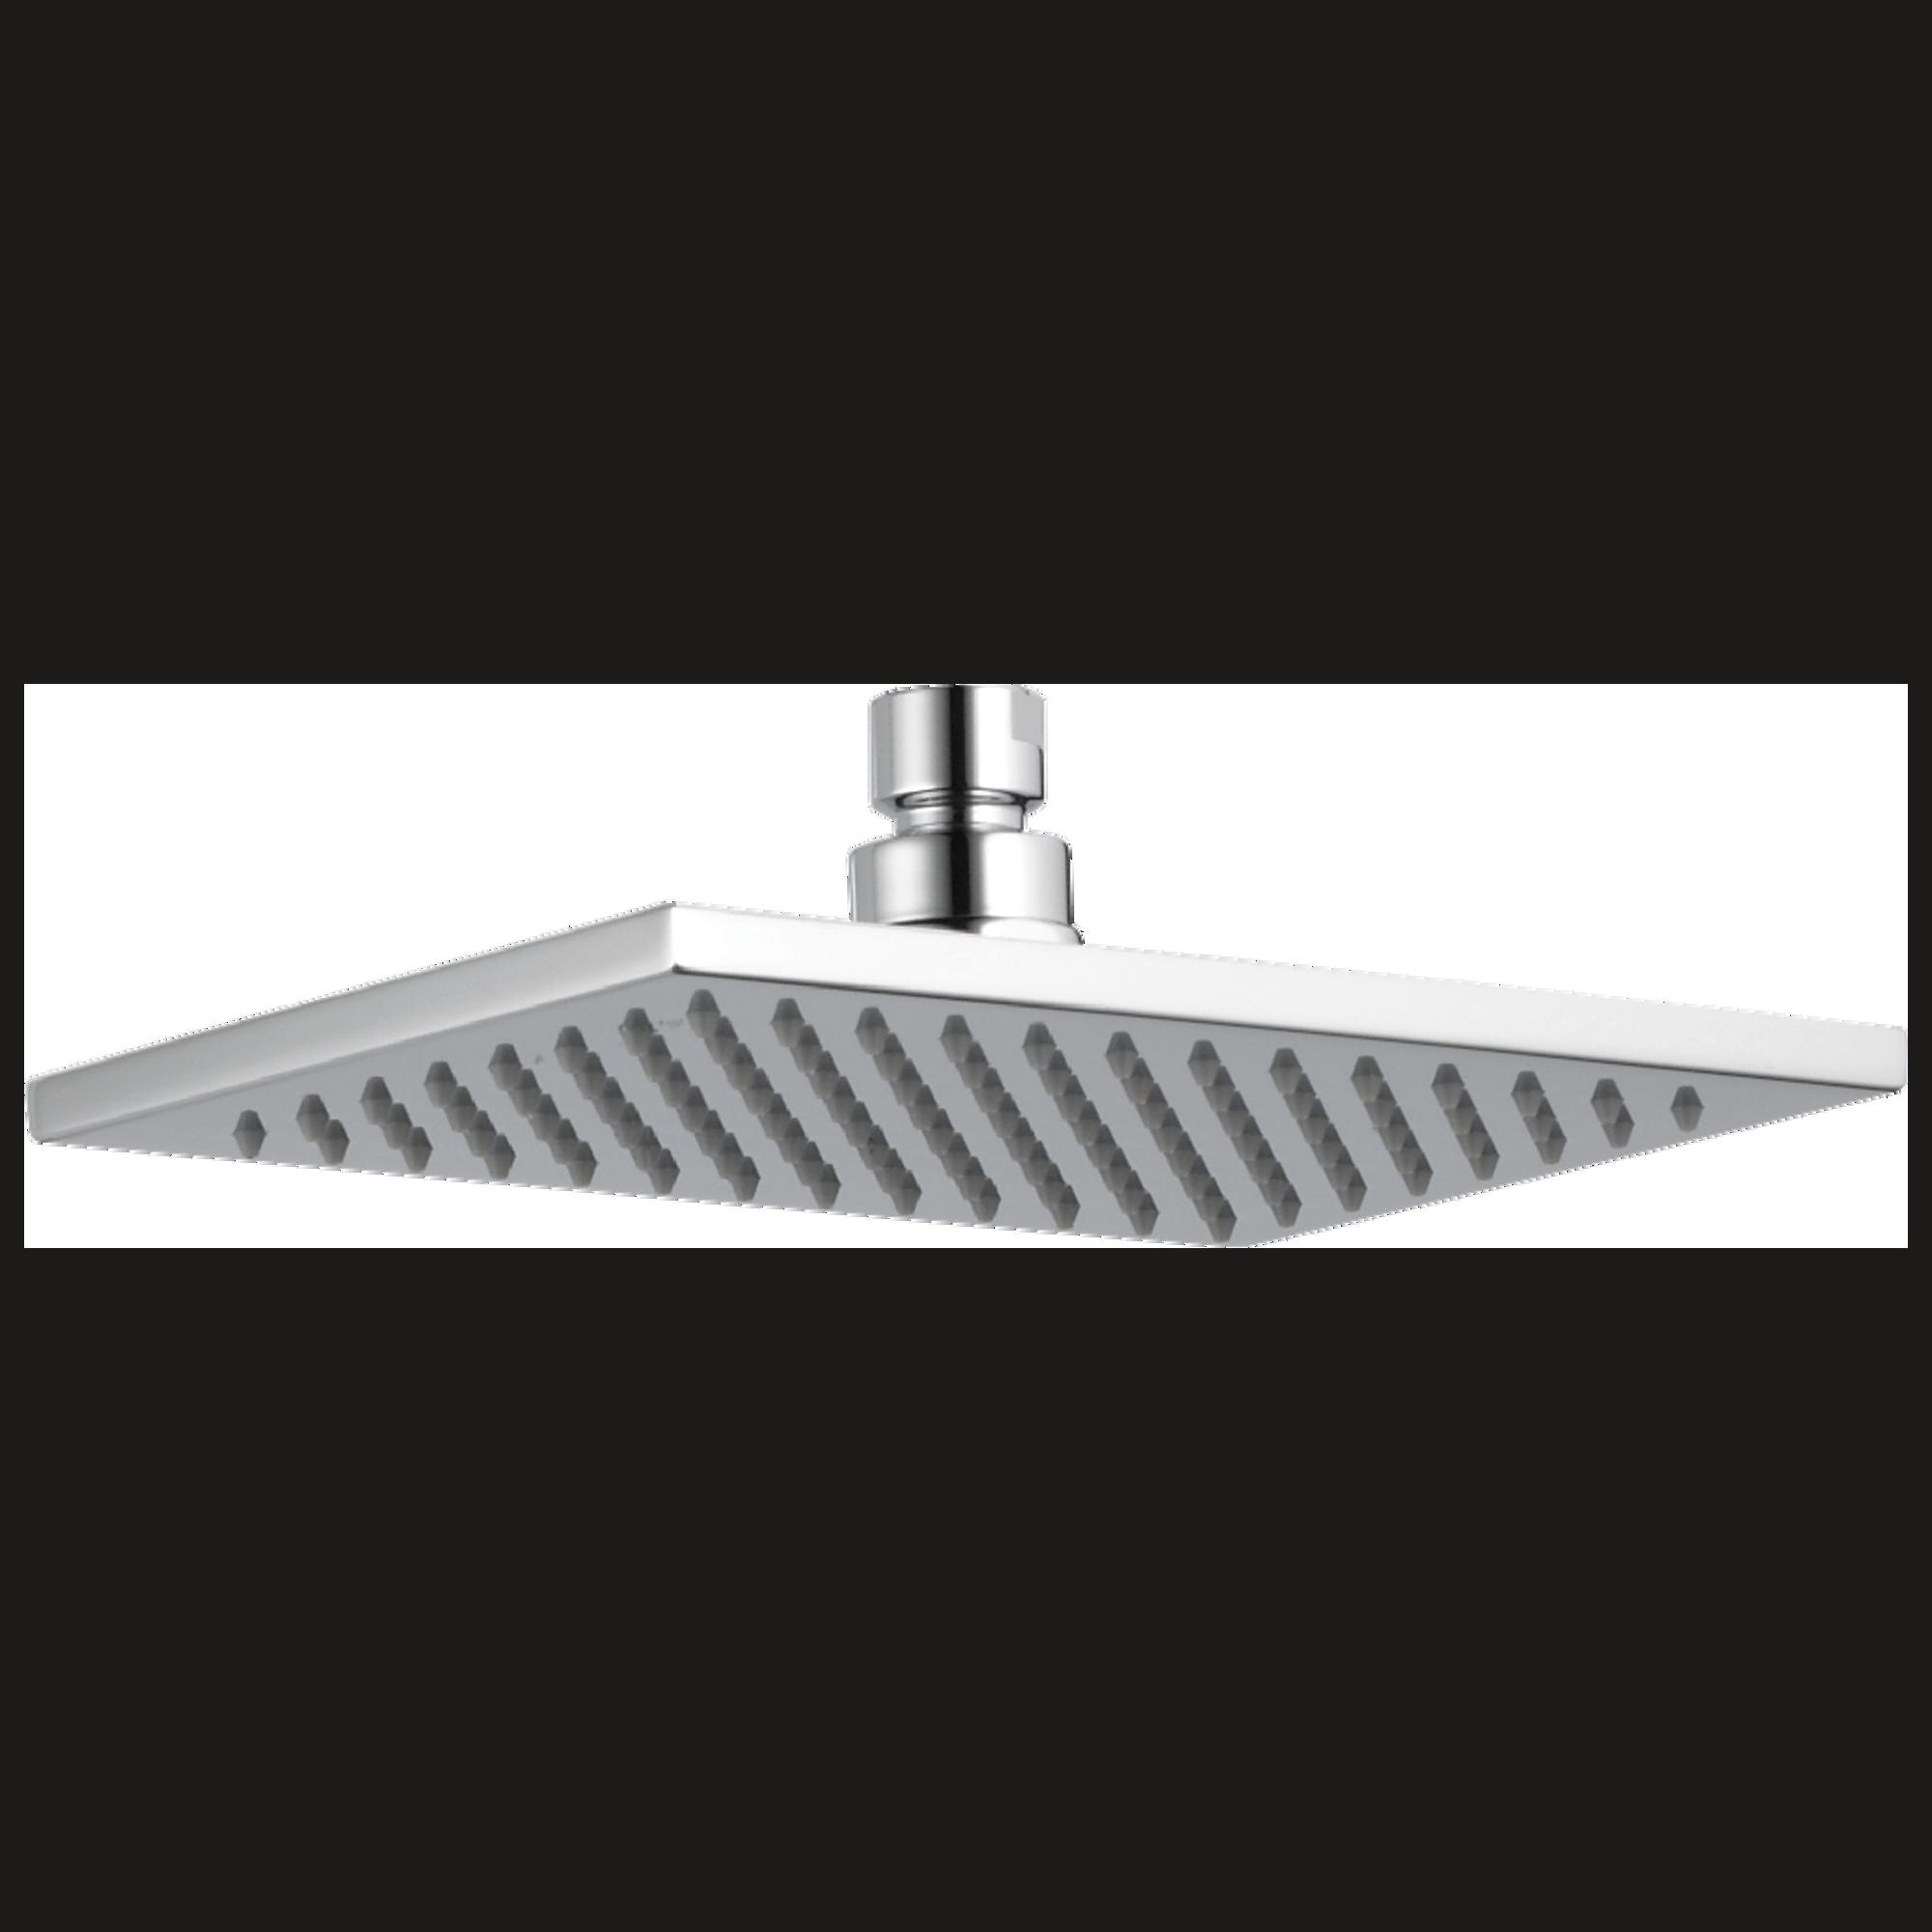 Delta Faucet Rp91363 Shower Head Chrome Shower Heads Delta